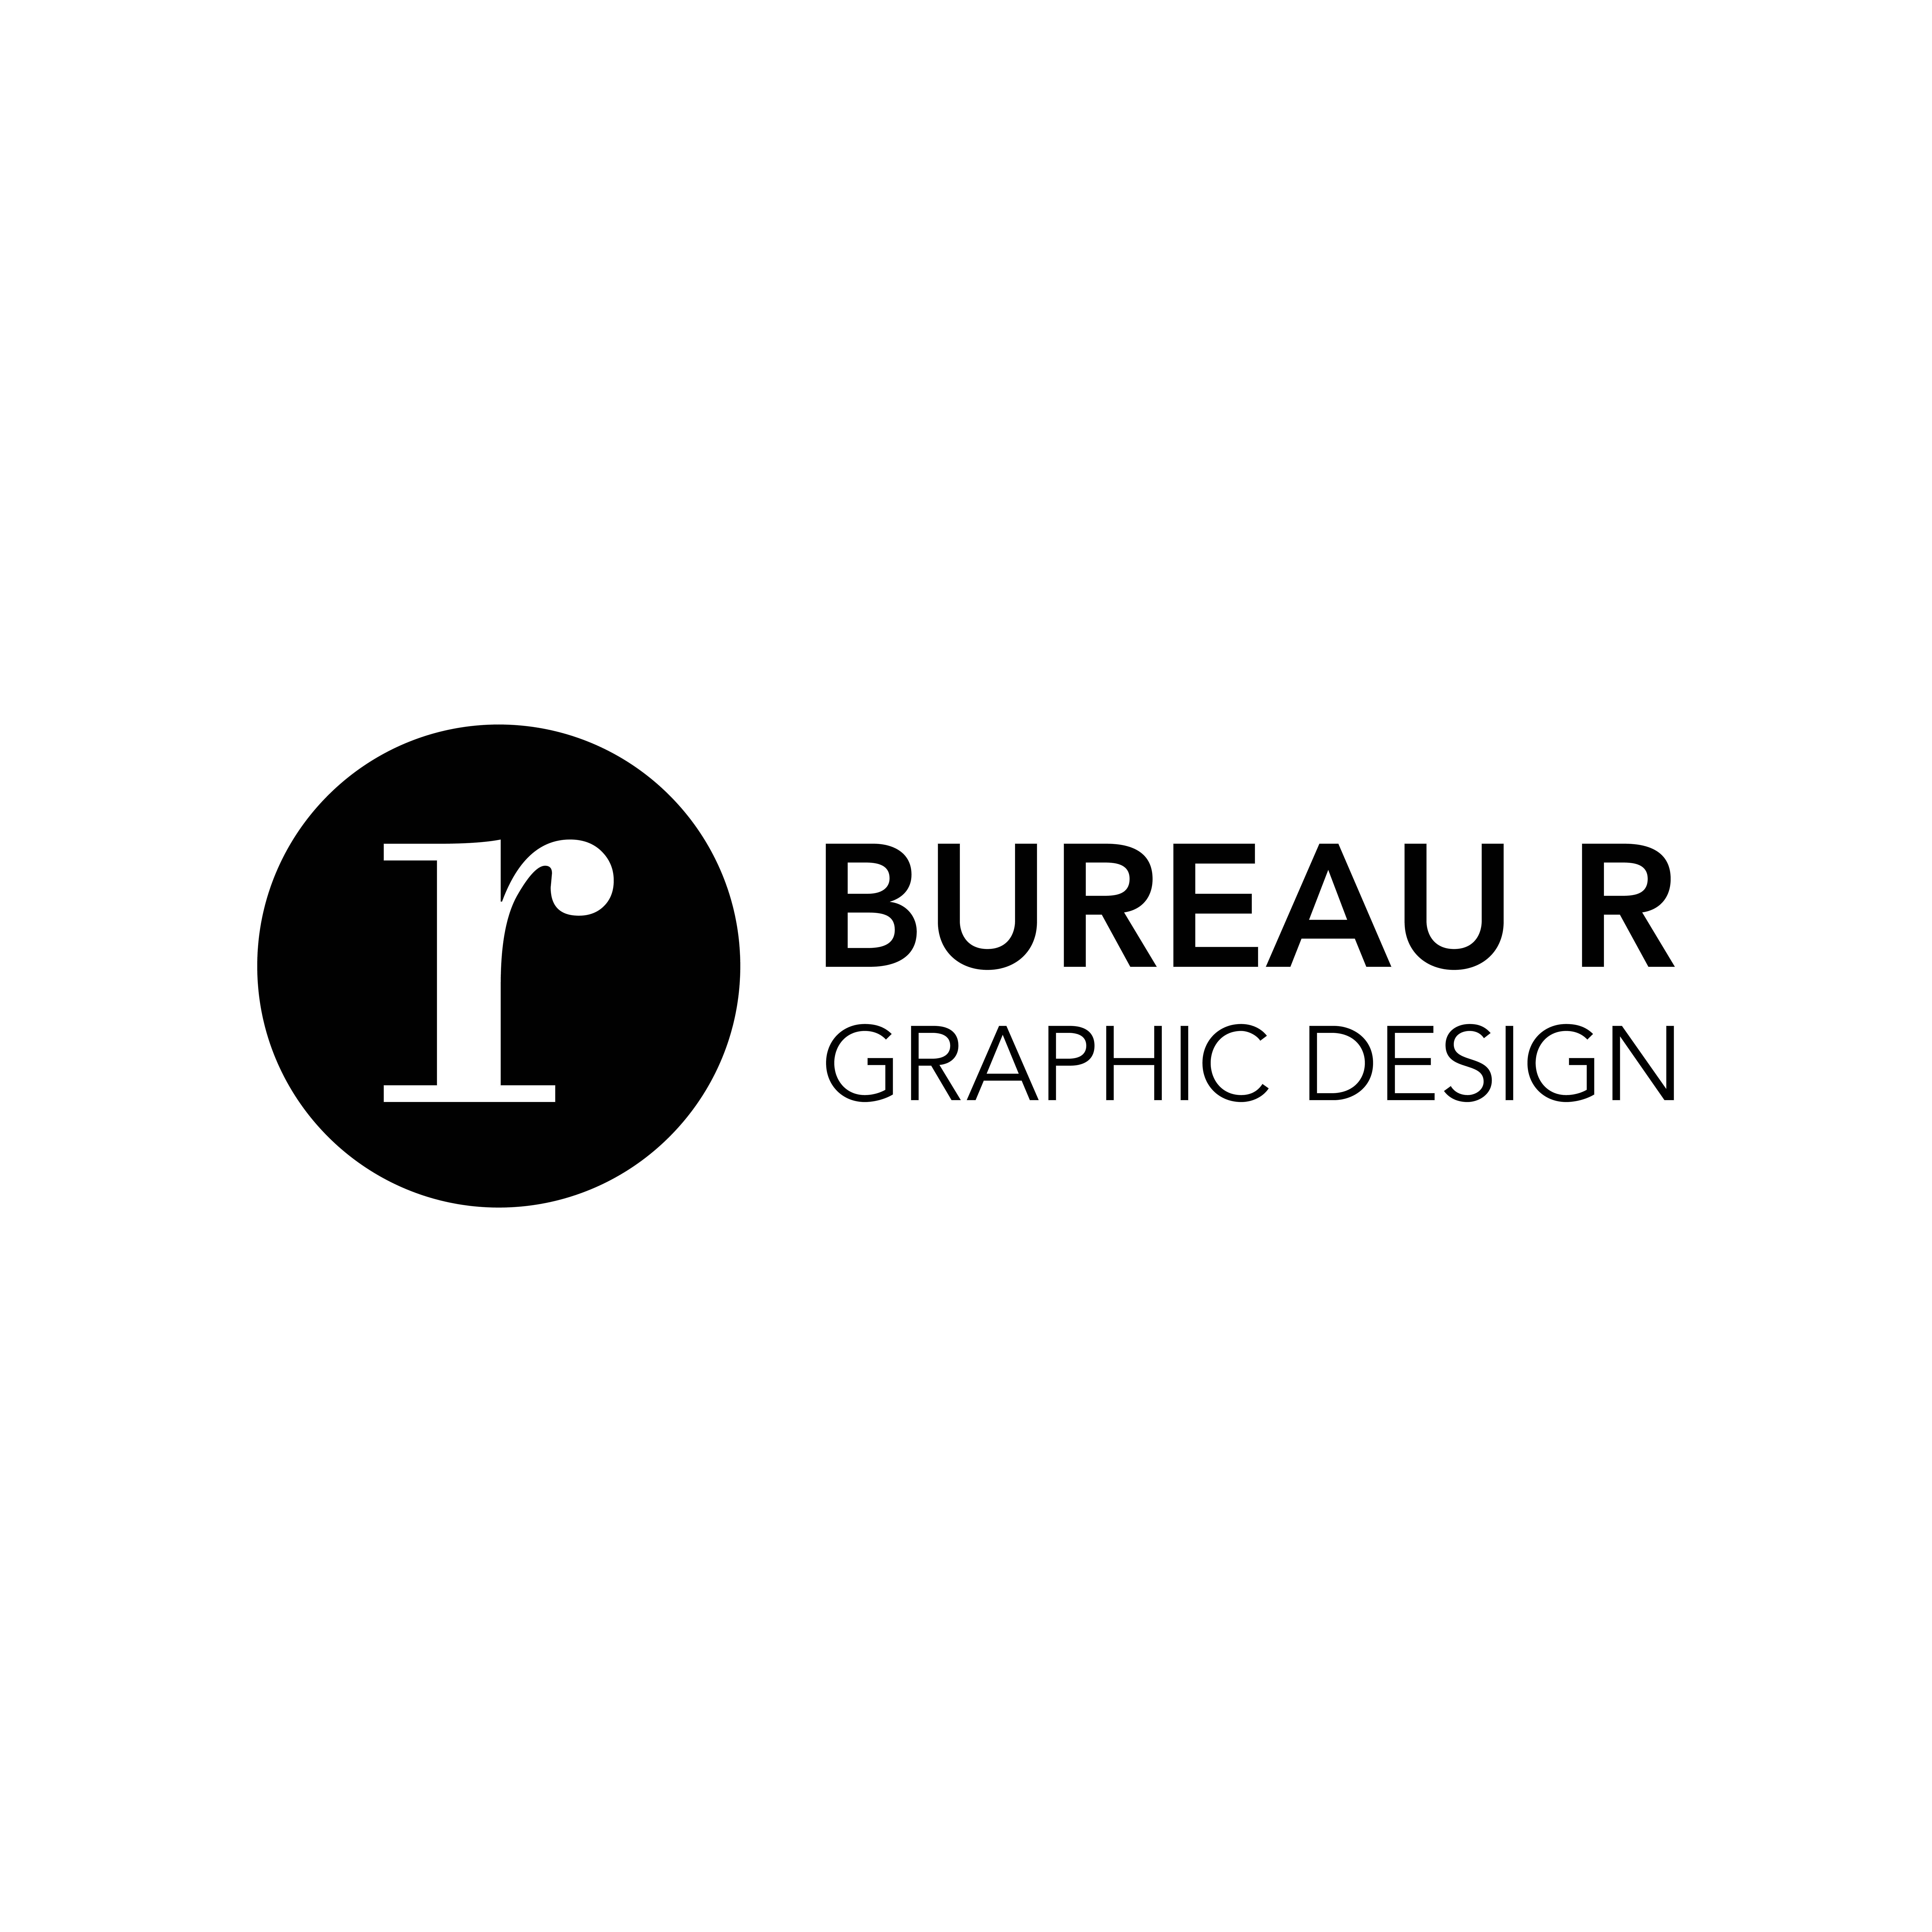 Bureau R logo